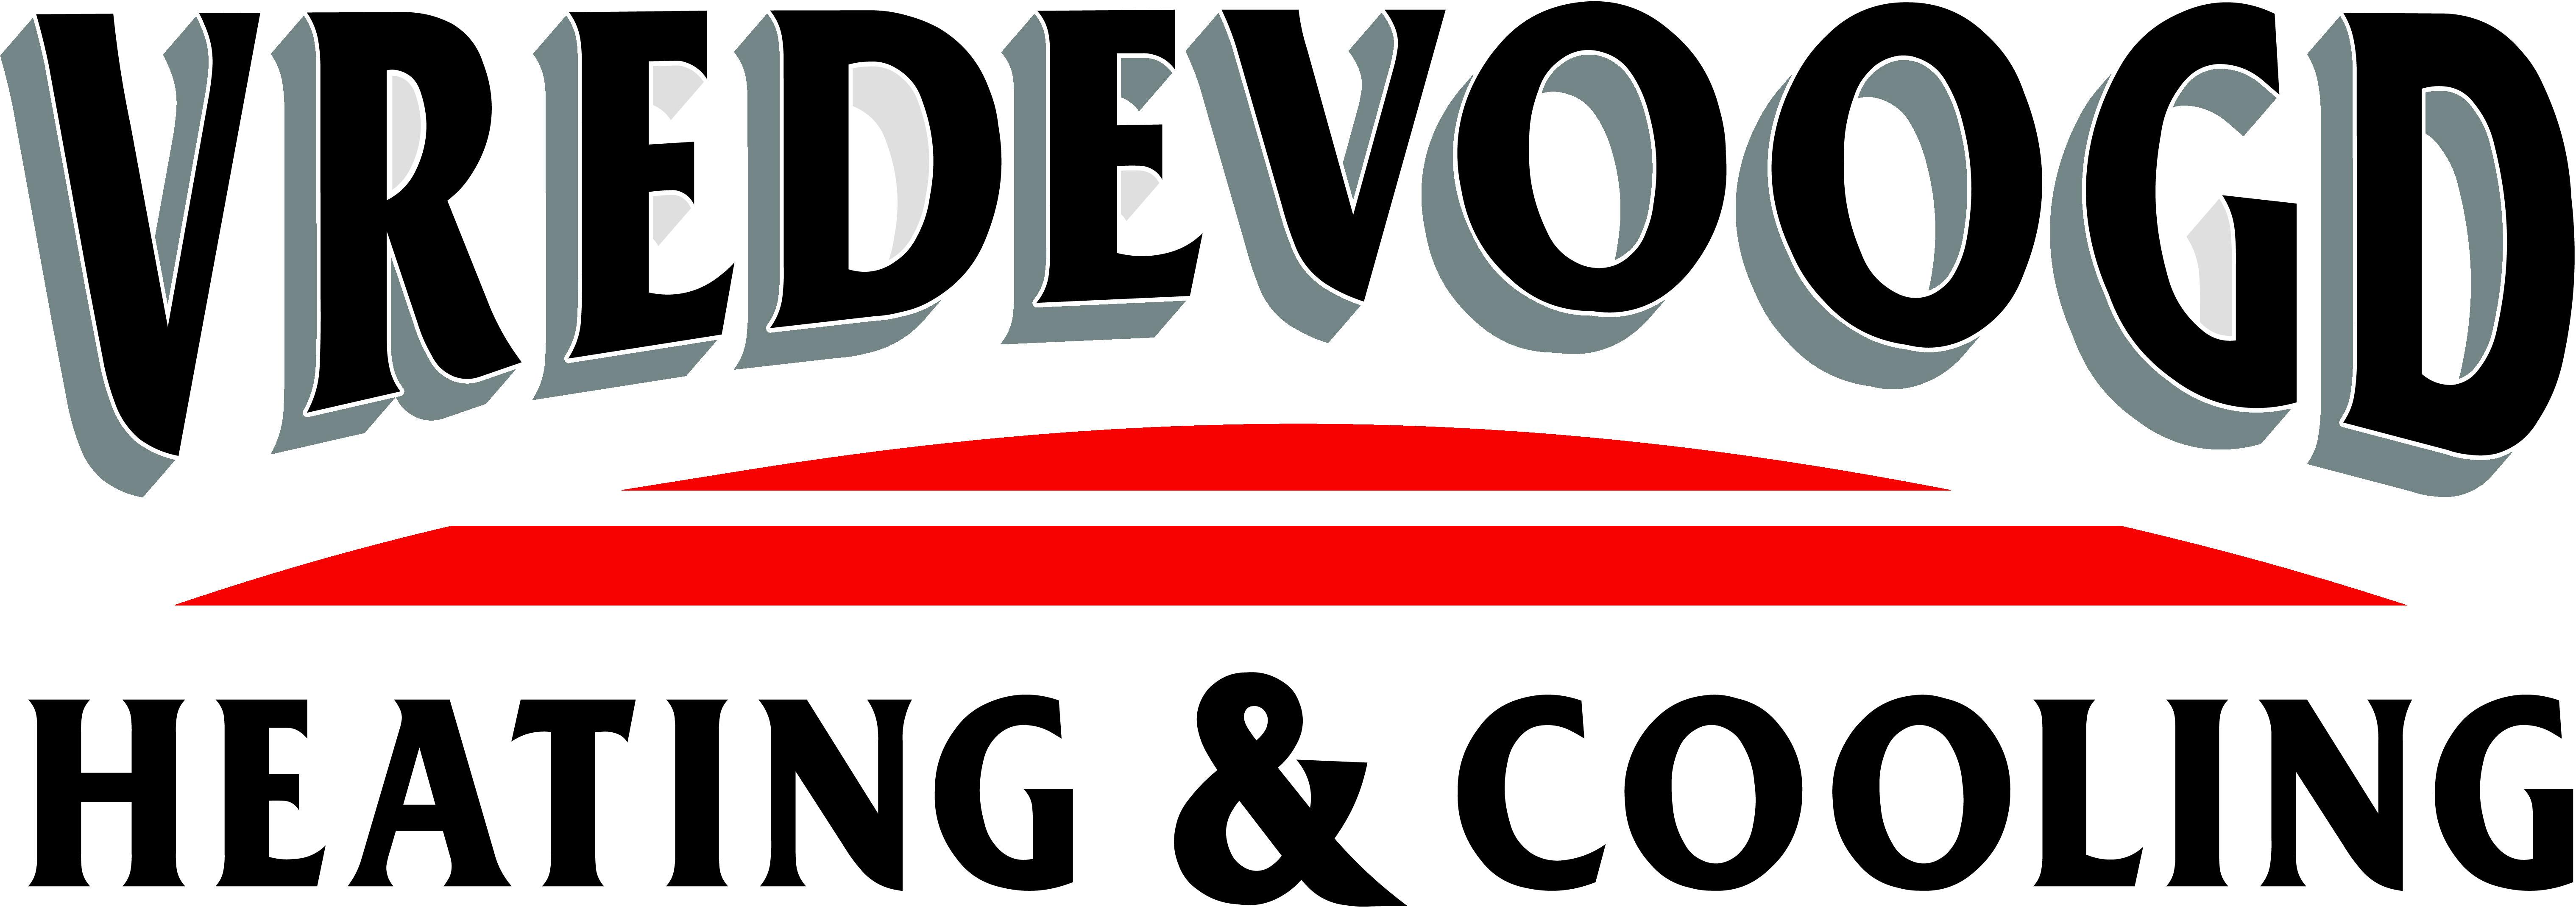 Vredevoogd Heating & Cooling Inc logo